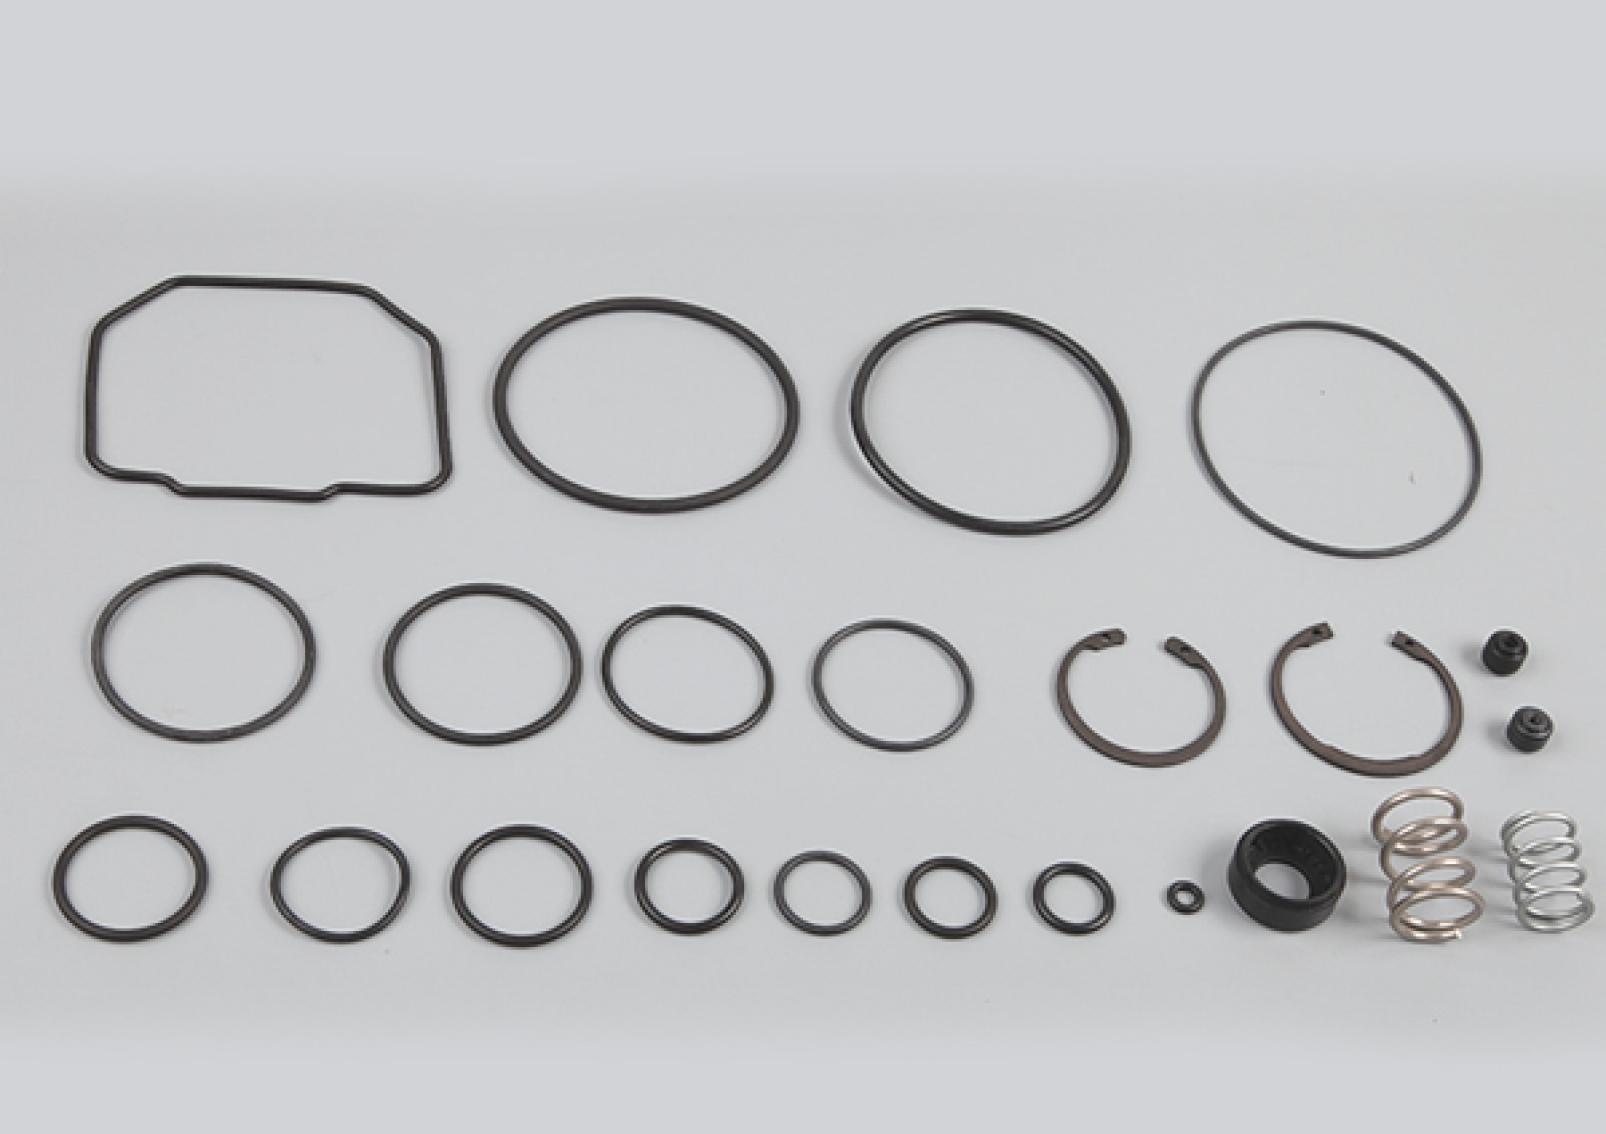 Ebs Trailer Control Valve Repair Kit, 0 486 205... Series